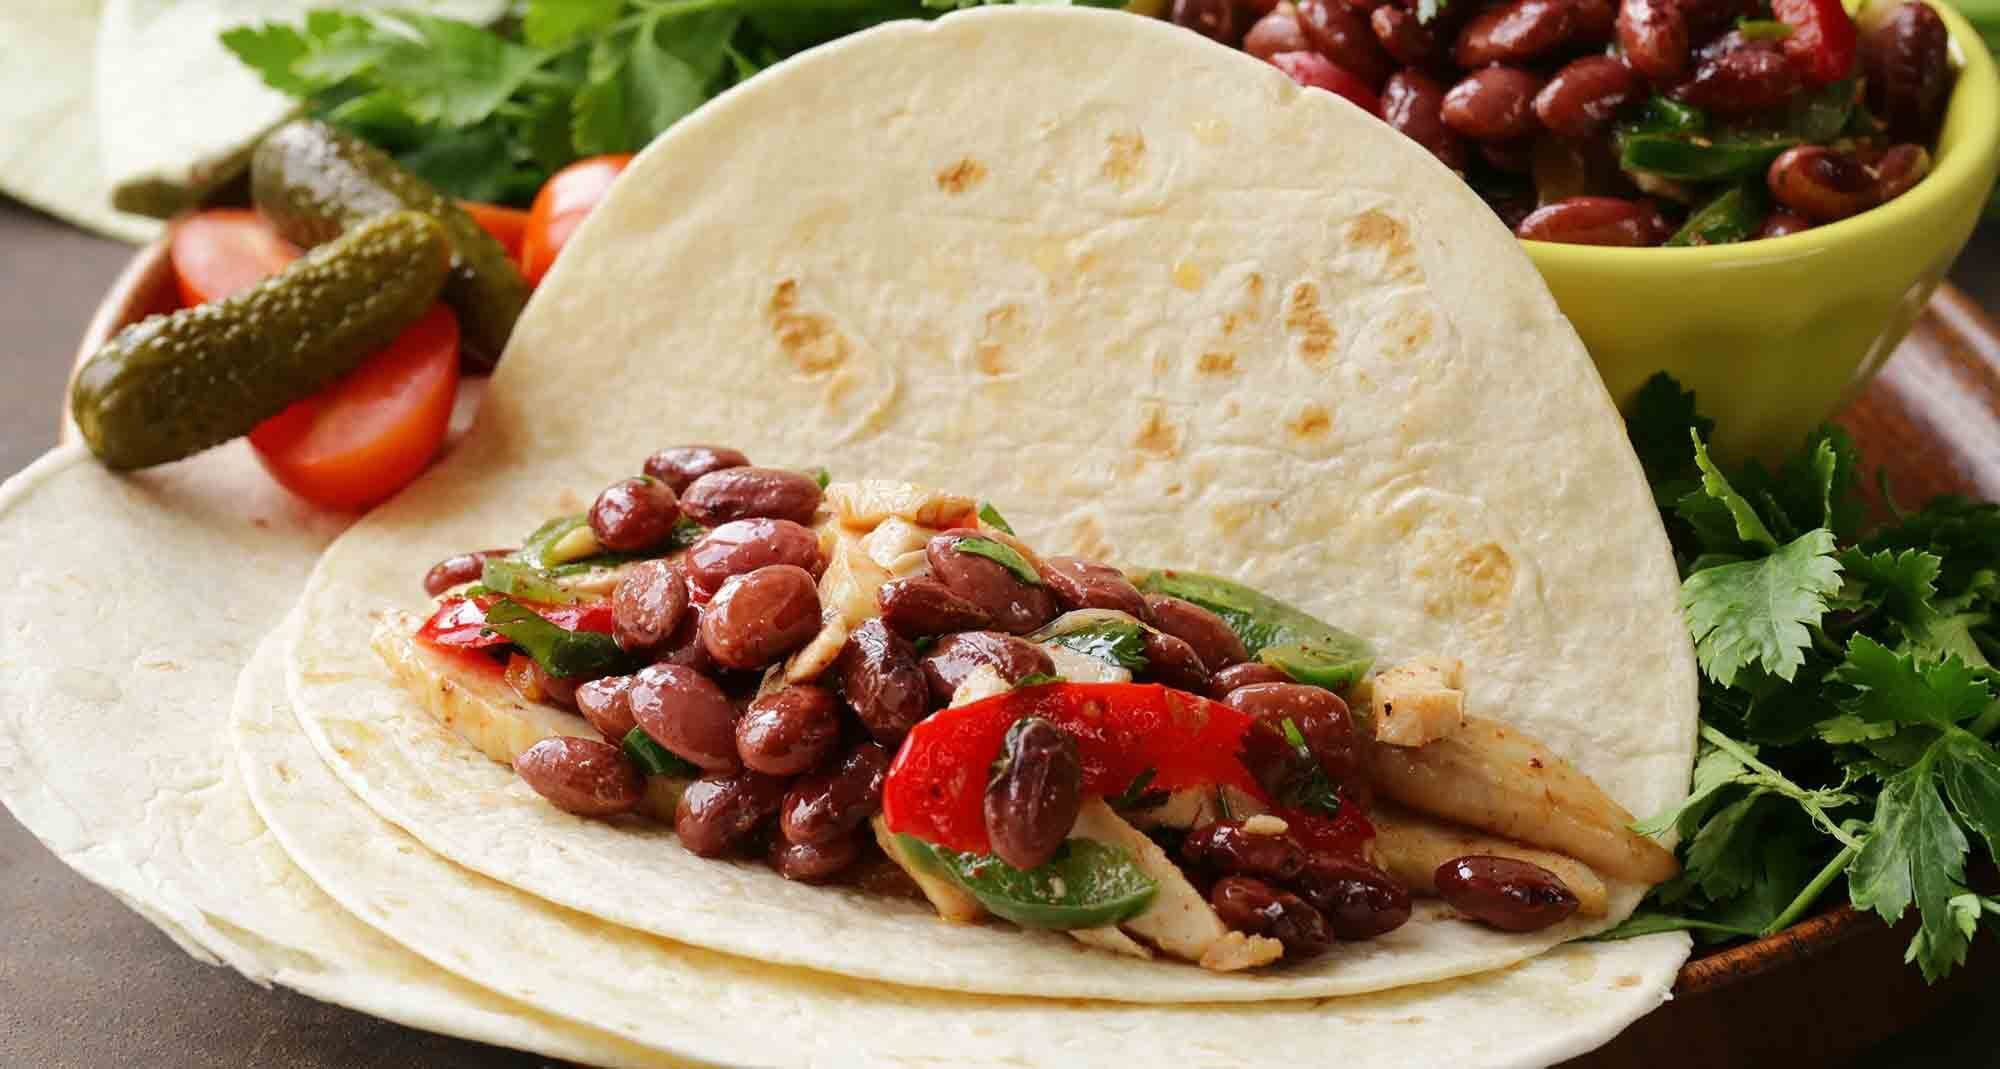 restaurantes gandia - tex mex - tacos - jack the pepper